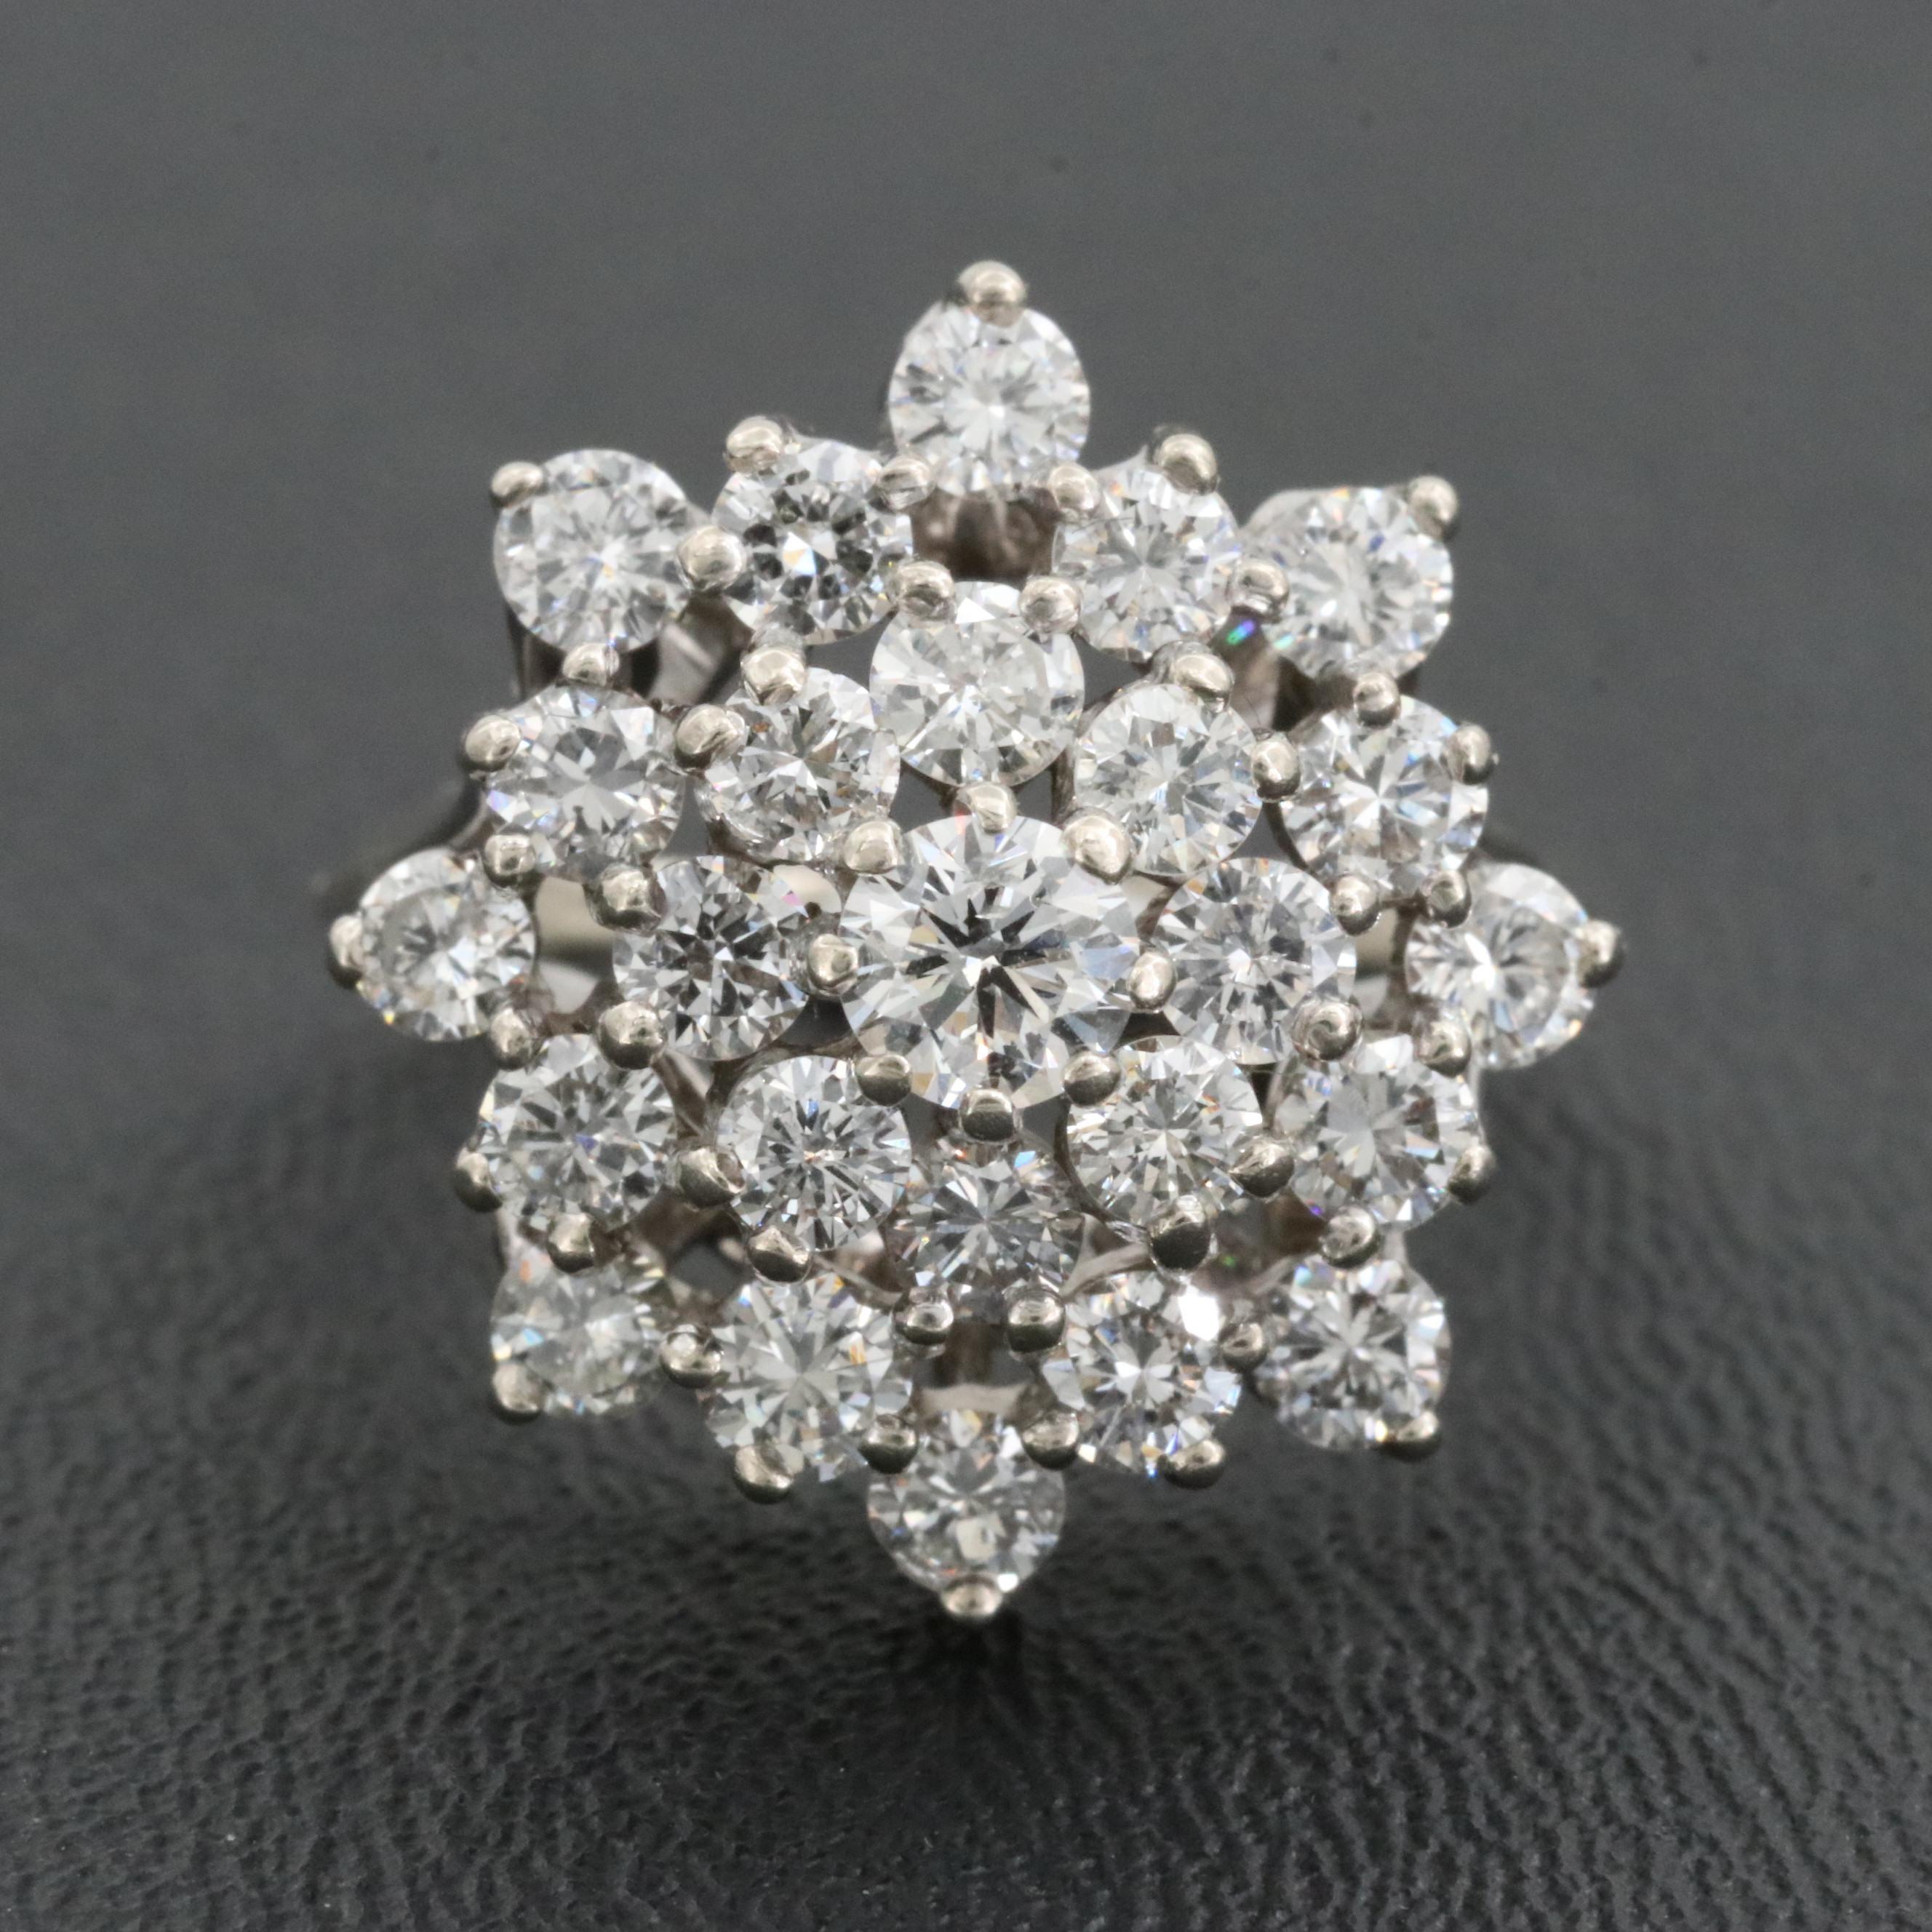 14K White Gold 2.05 CTW Diamond Ring